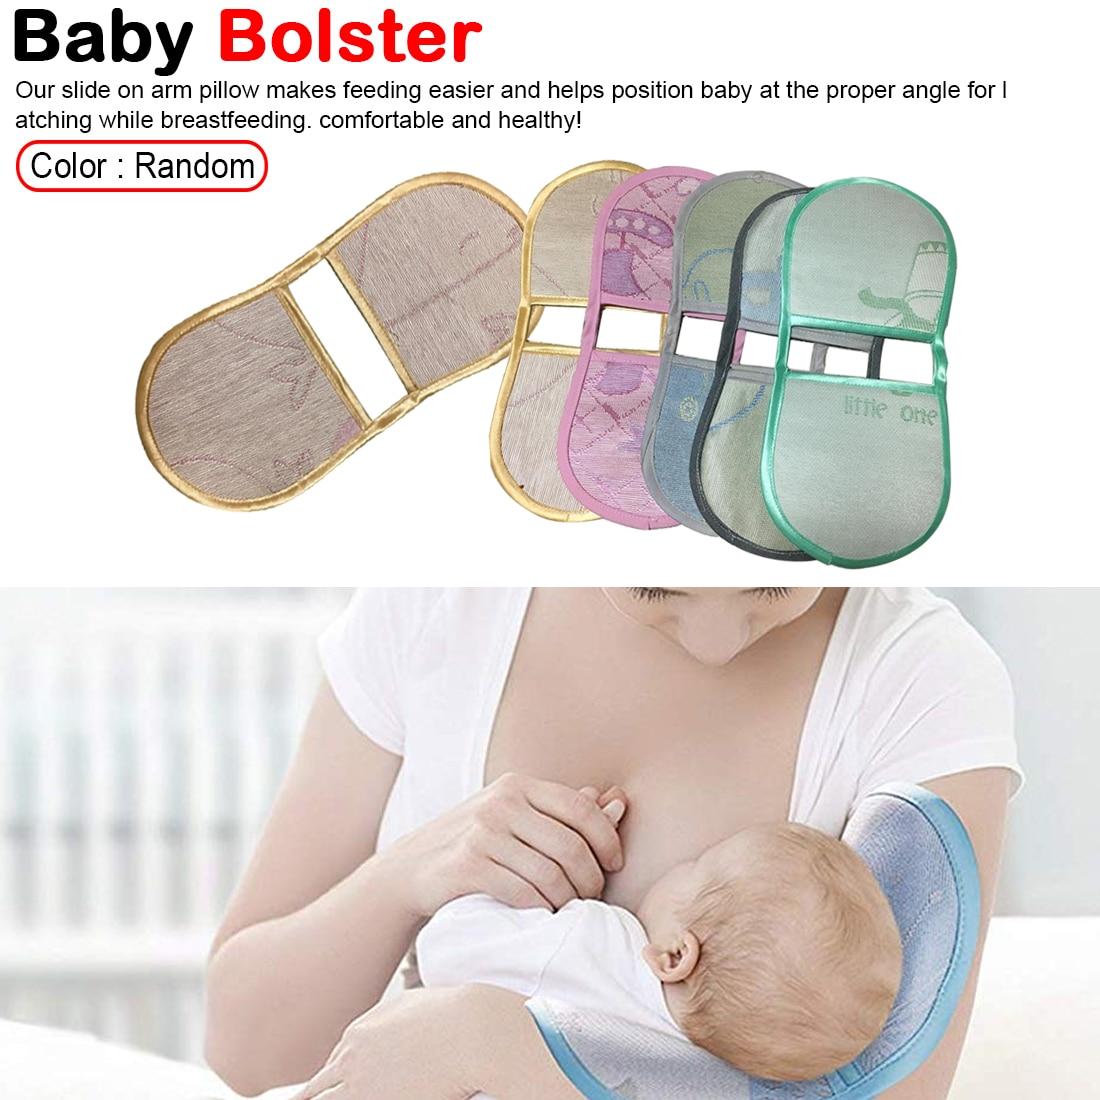 Random Color Hot Summer Protection Babycare Breastfeeding Arm Mat Nursing Sleep Cool pillow Newborn Sleeping Ice Pillow Mat Pad in Pillow from Mother Kids